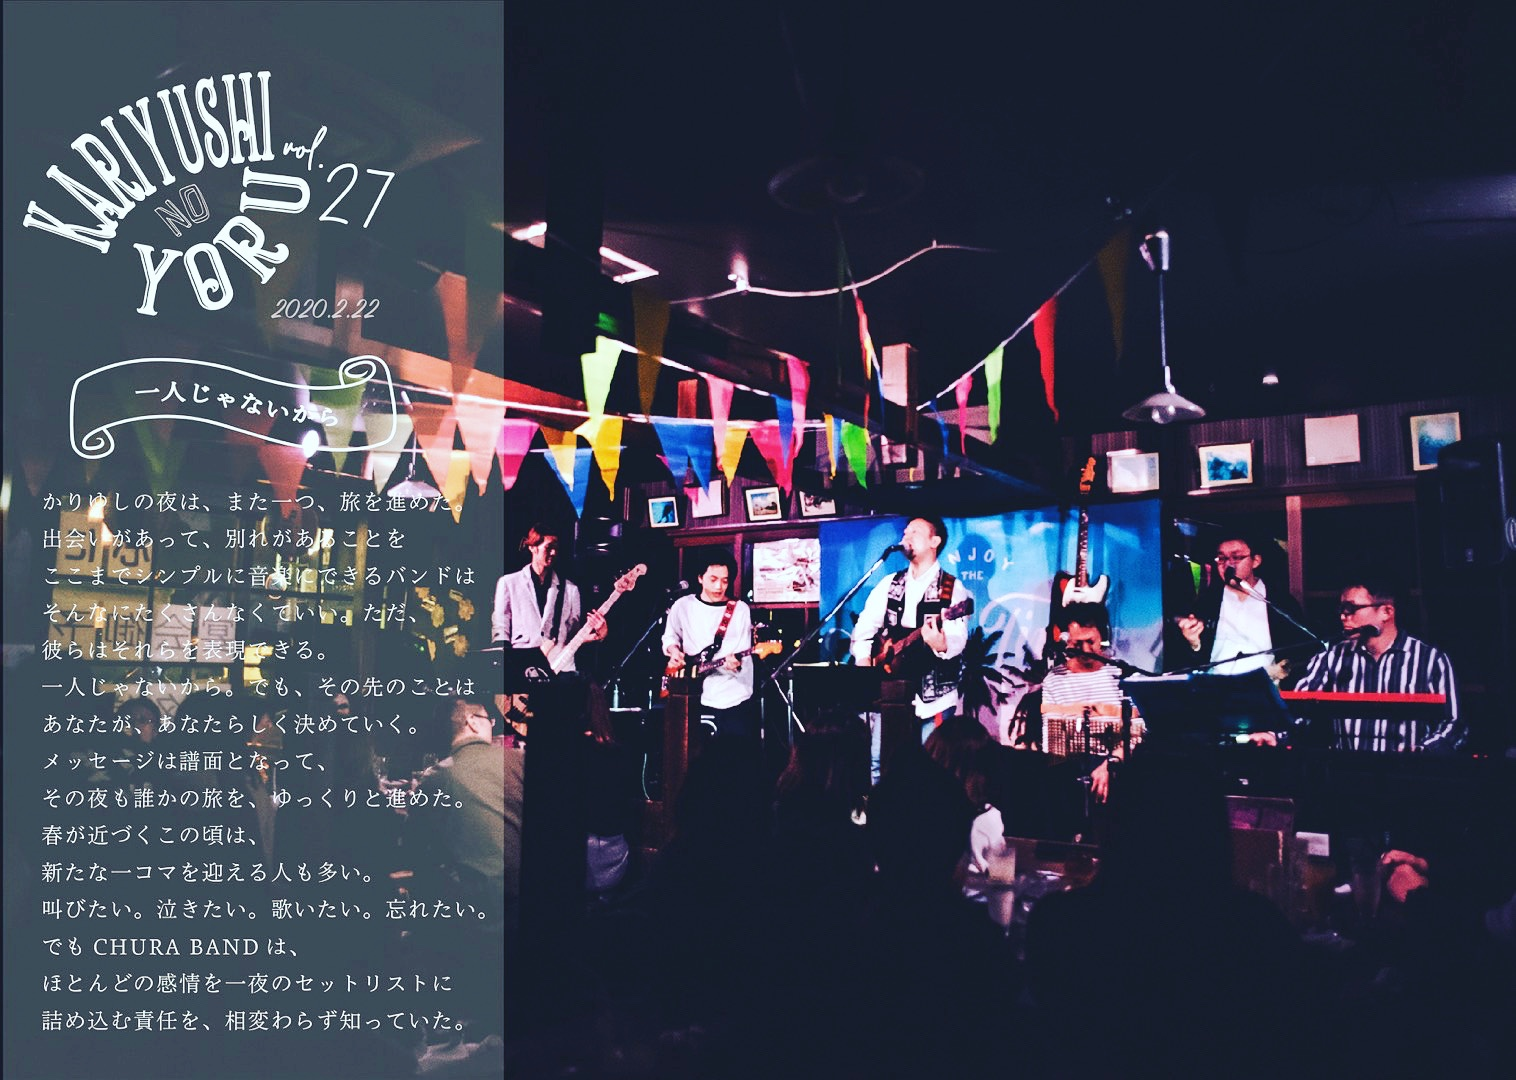 2020.02.22 LIVE REPORT text : atsushi takaoka